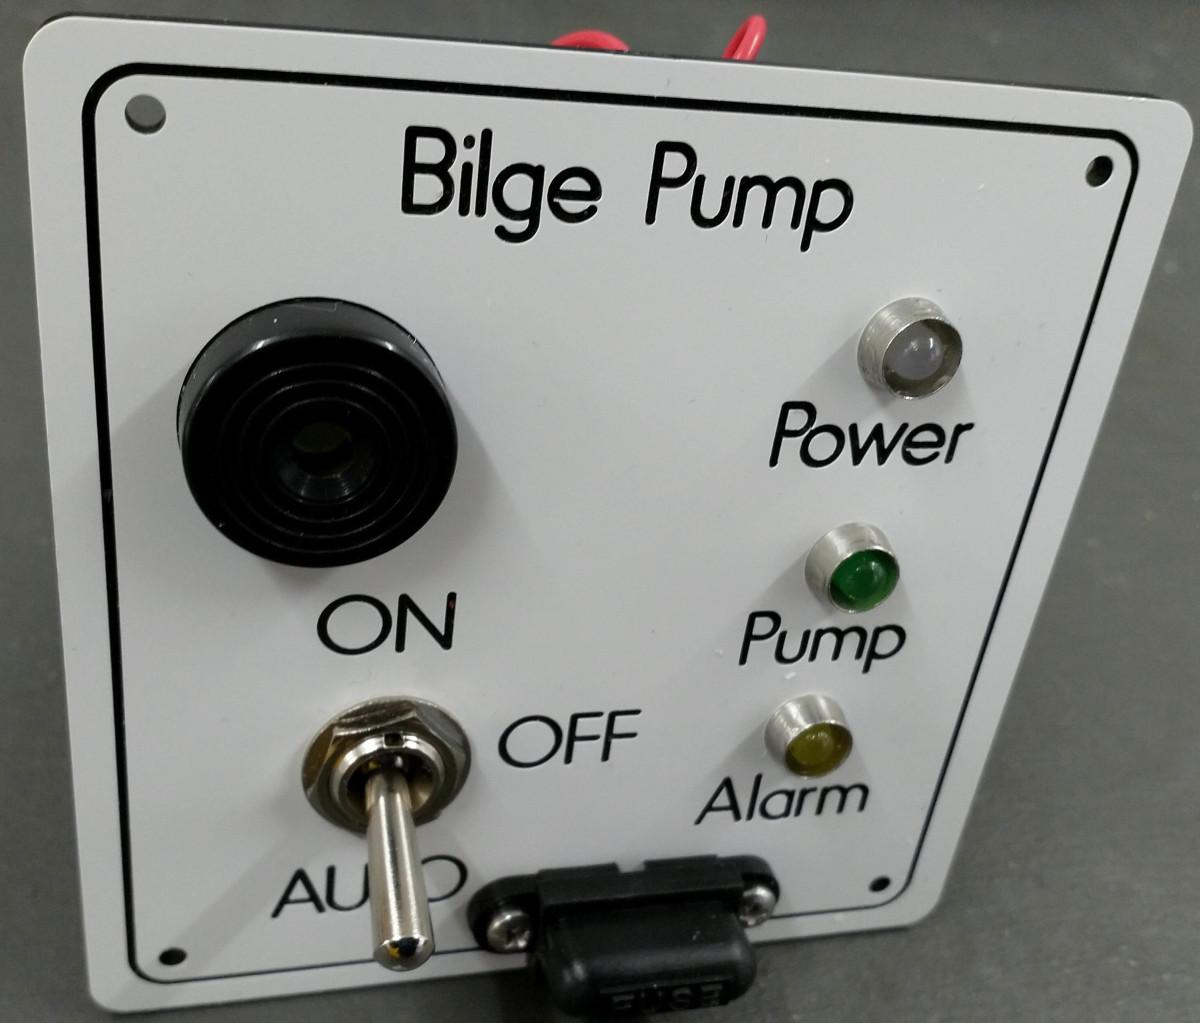 web_bilge pump switch s291817907805397470_p82_i2_w2560